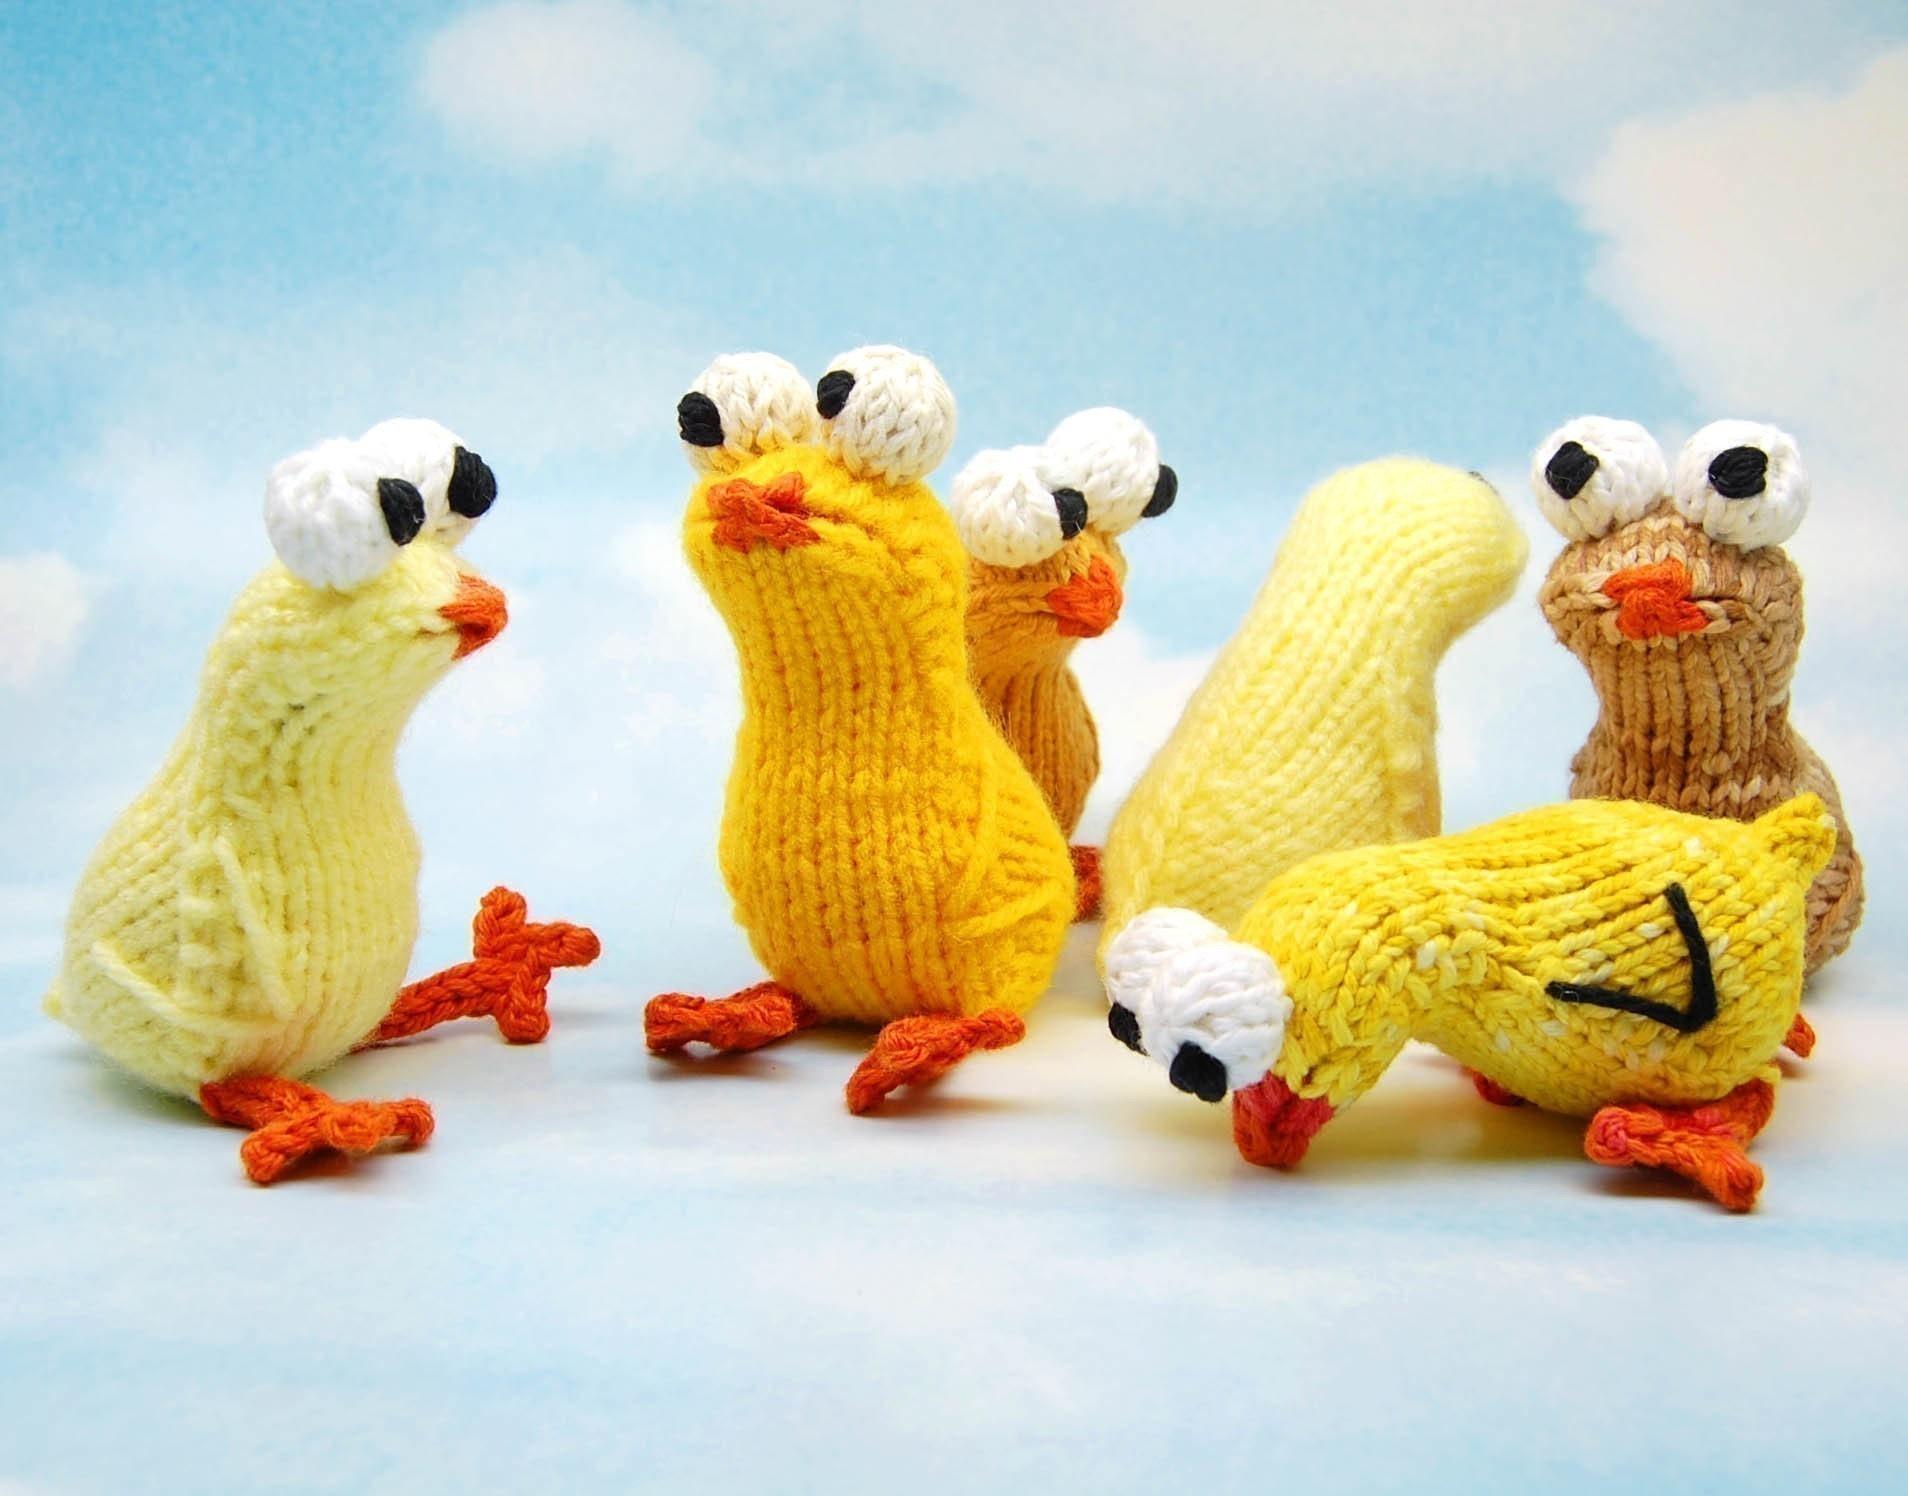 Free Crochet Pattern Amigurumi Bear : Chickies Amigurumi Easter Chick Plush Toy Knitting by ...